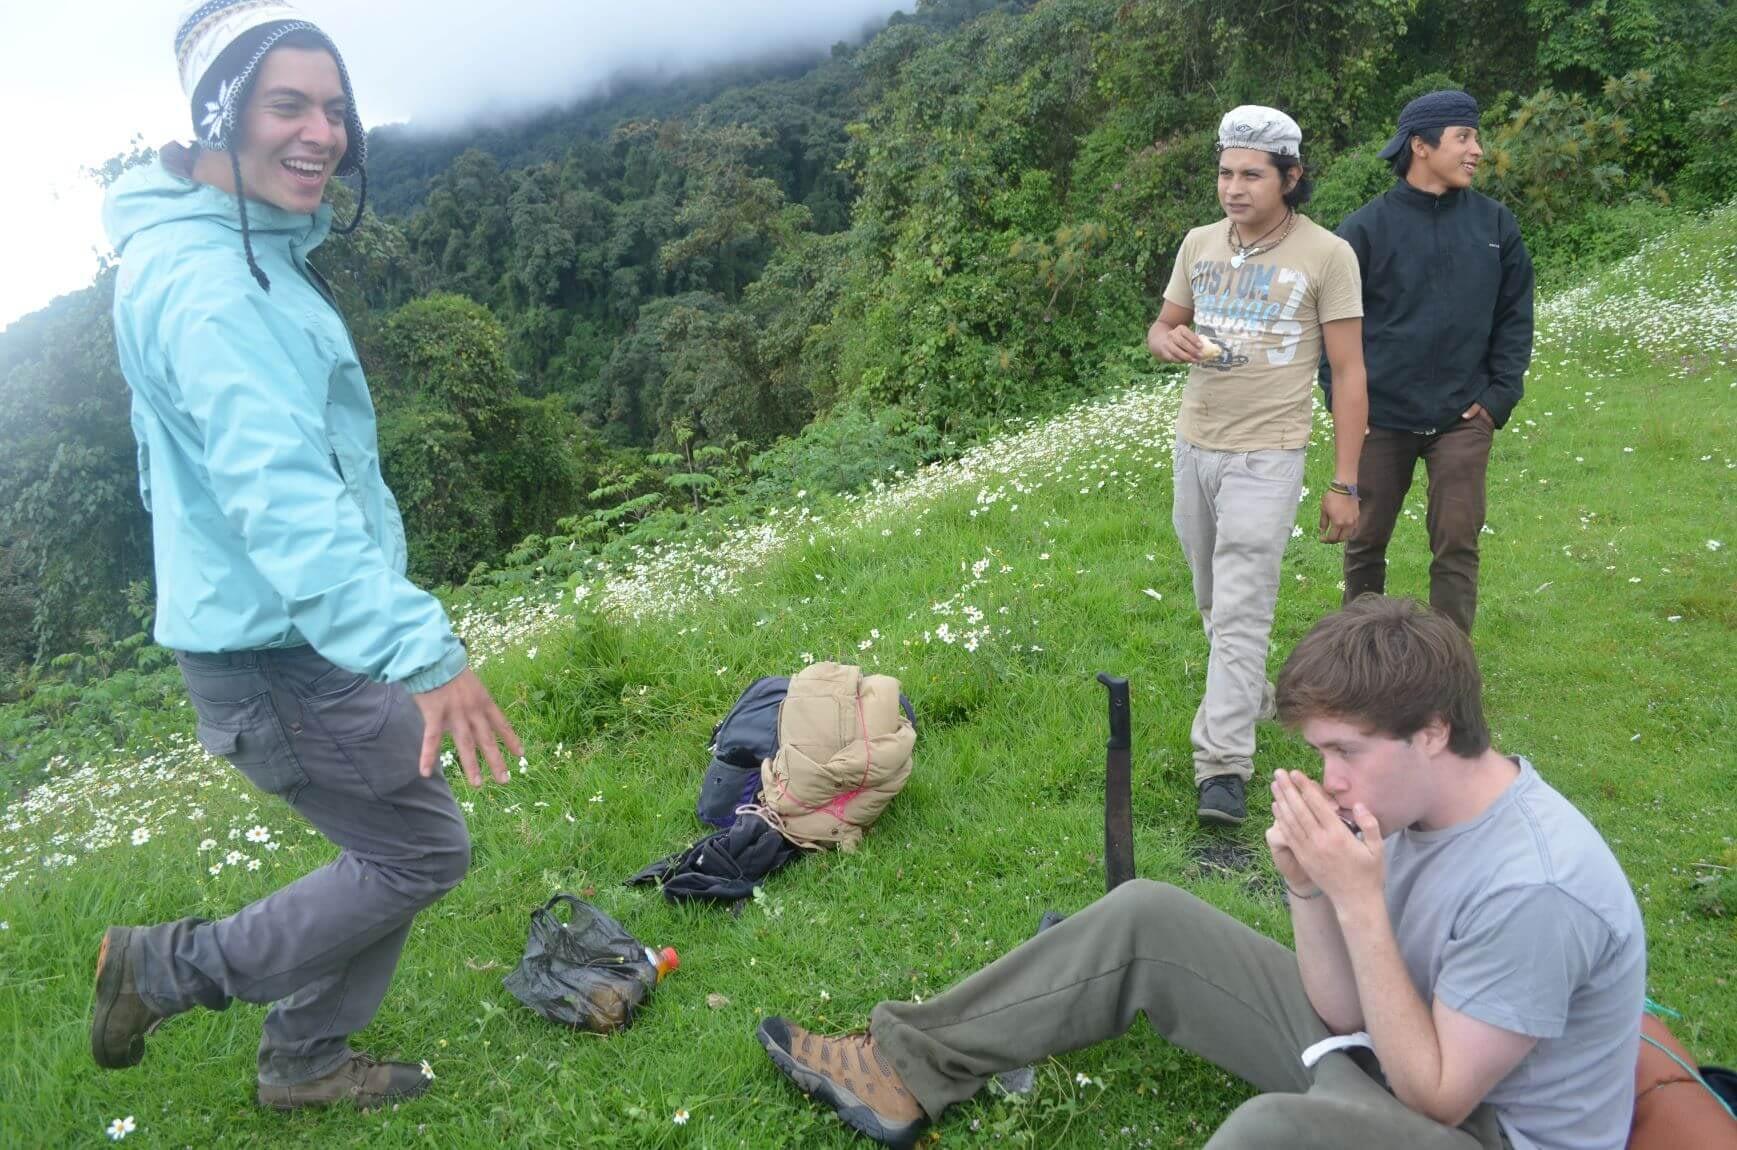 Listening to Harmonica on the way hiking up Acatenango Volcano